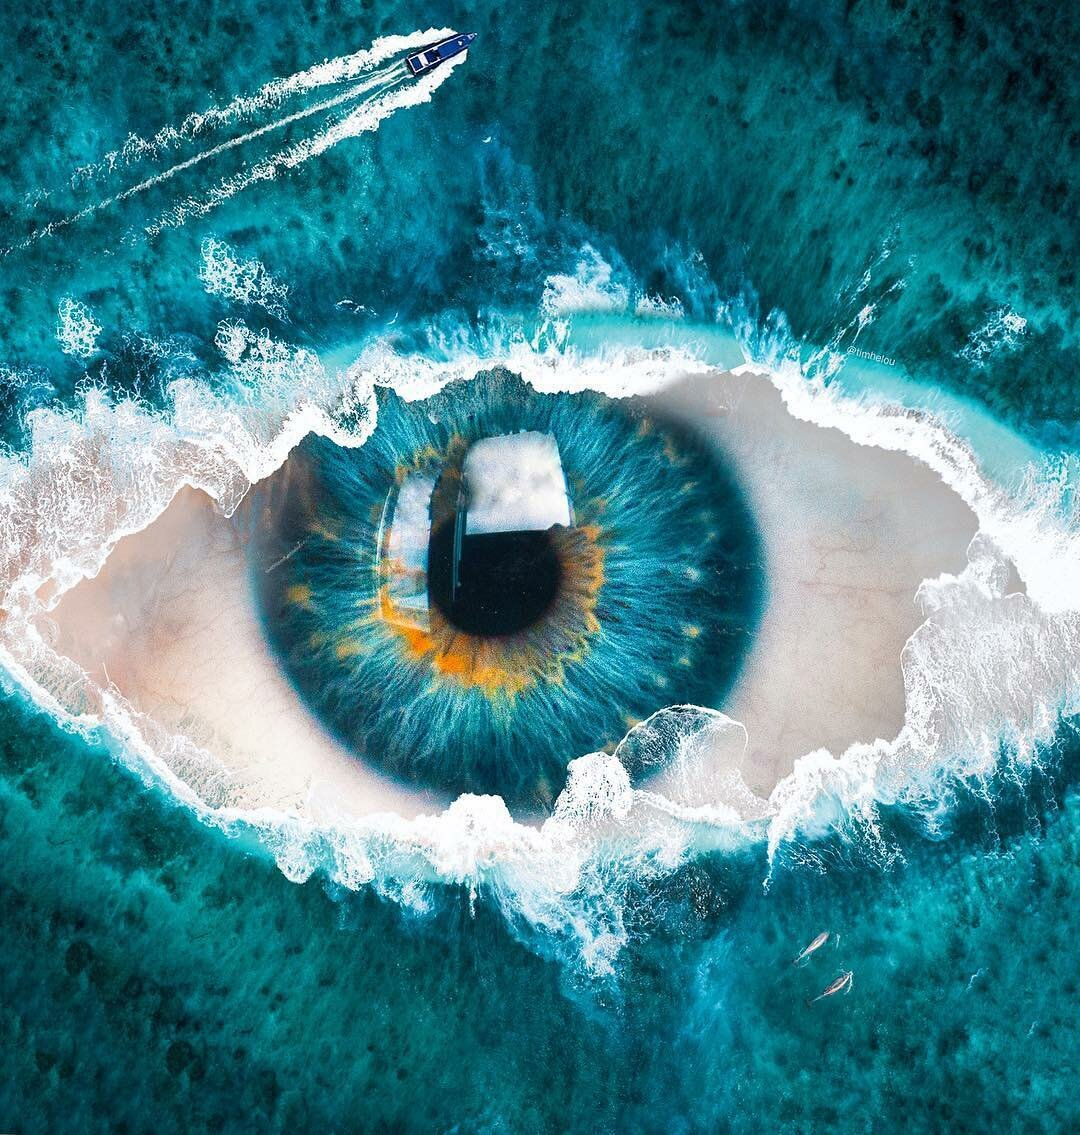 картинка глаза неба синего планах насти